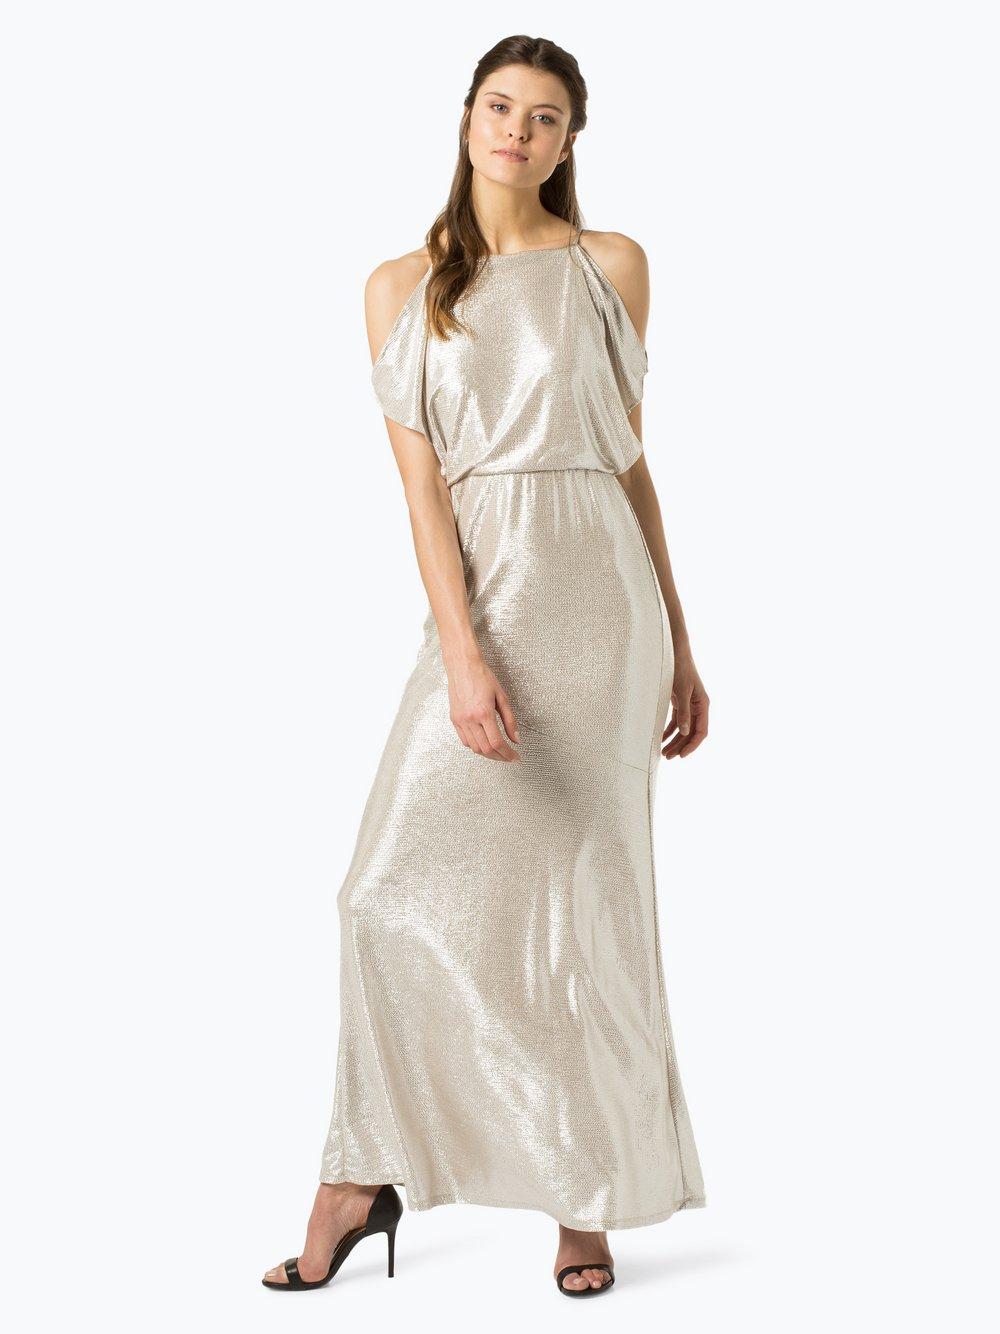 Lauren Ralph Lauren - Damska sukienka wieczorowa, złoty